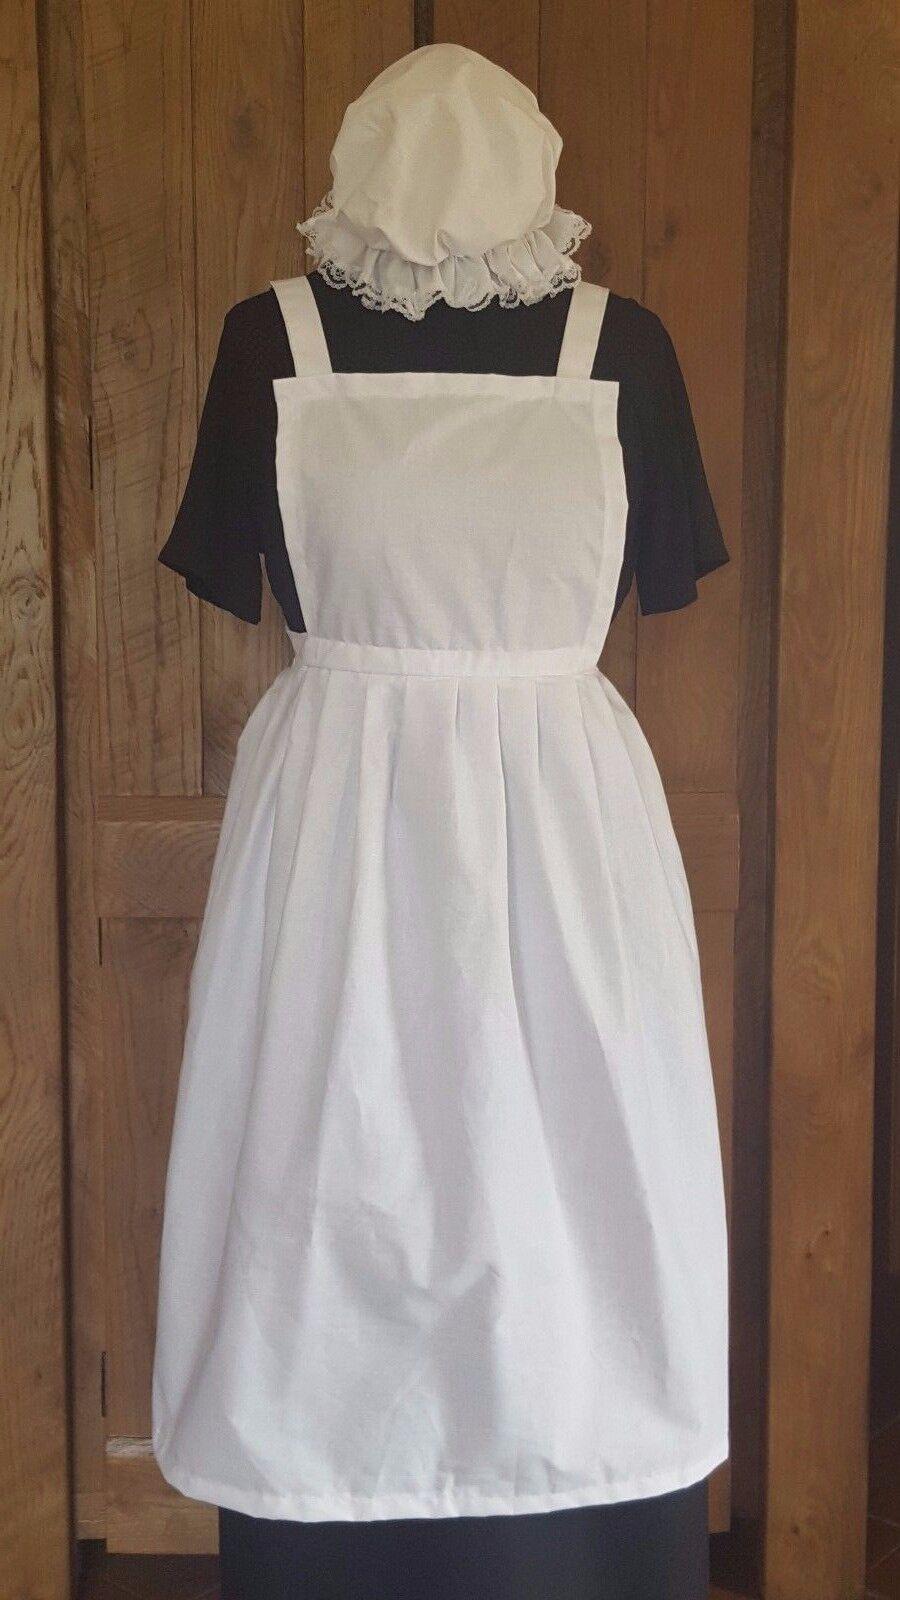 LARGE LADIES FANCY DRESS FULL APRON & MOP CAP Victorian Edwardian Poor WW1